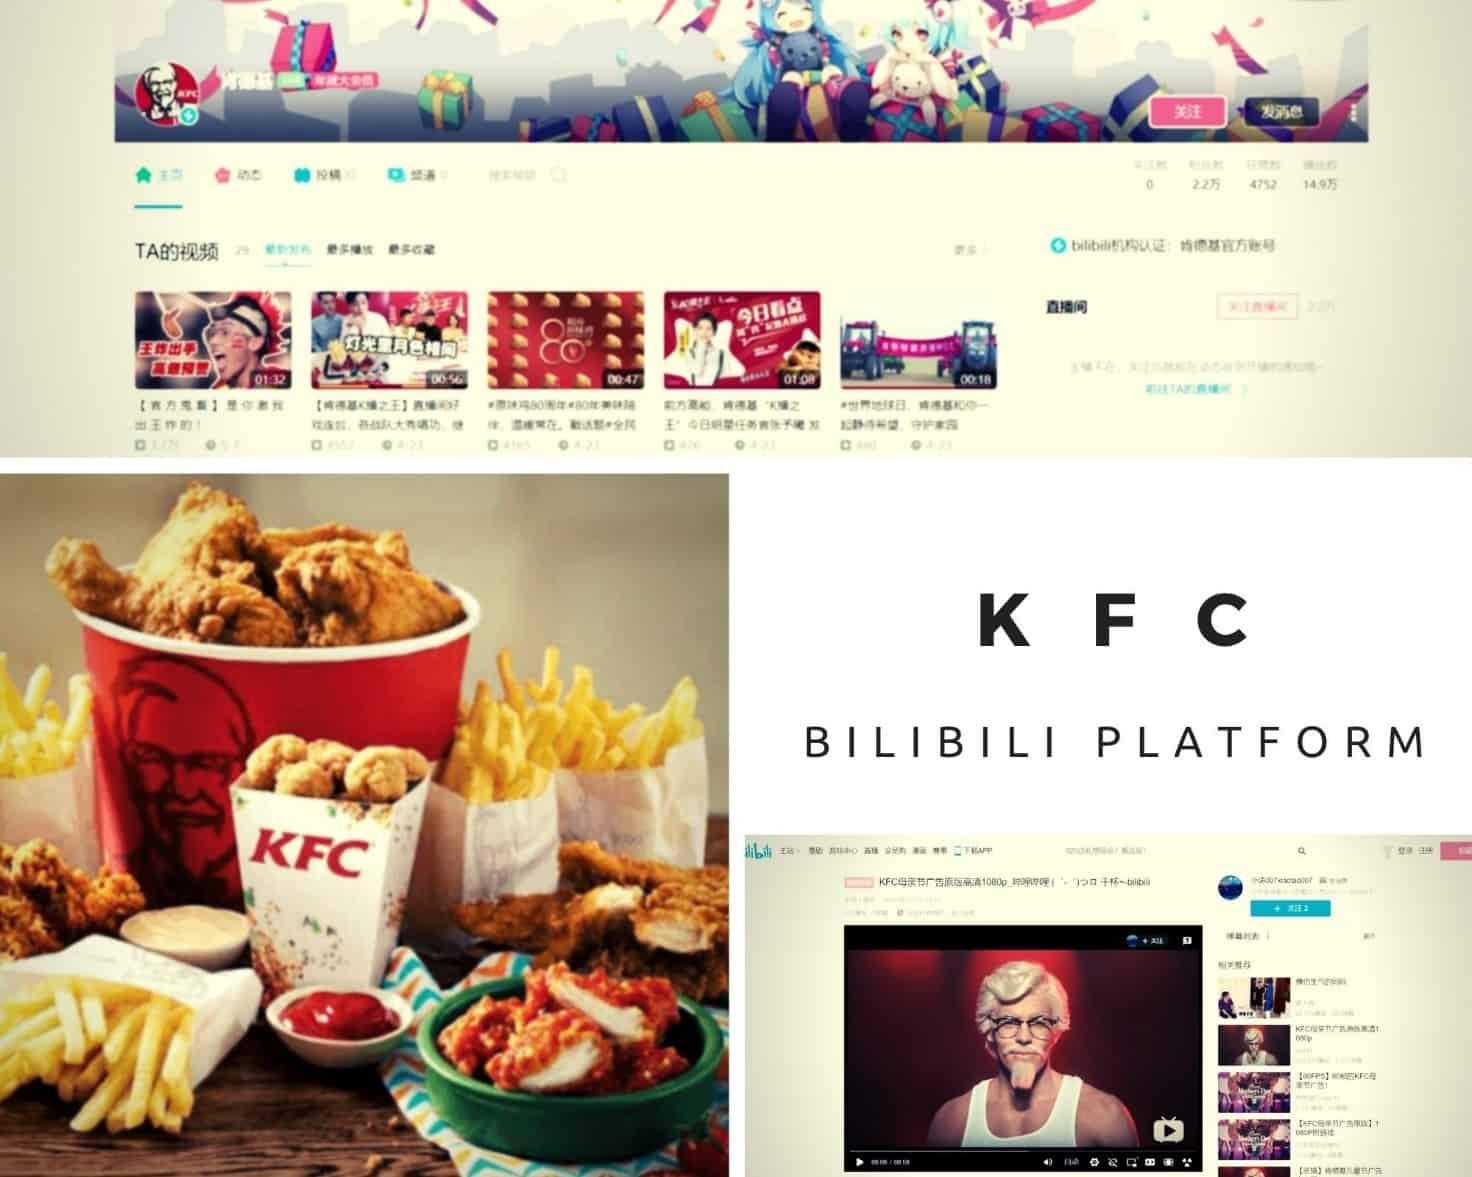 KFC ACCOUNT AND STRATEGY ON BILIBILI